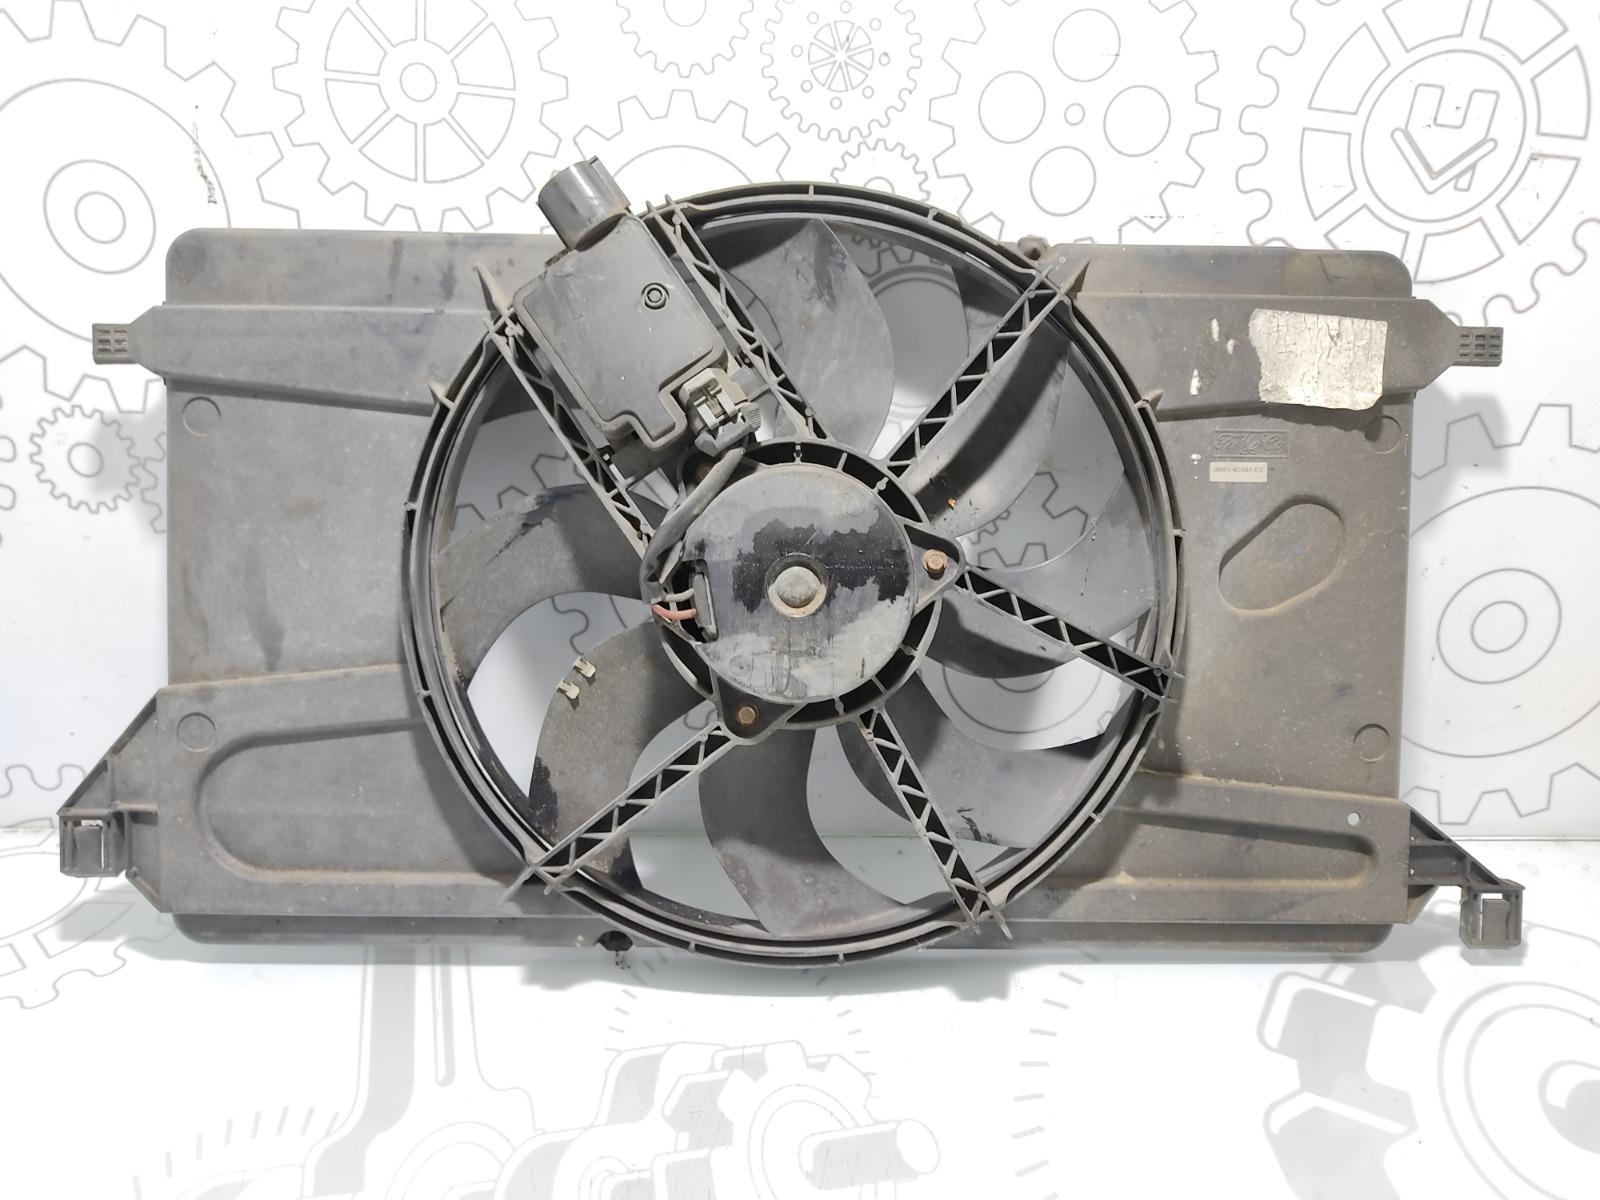 Вентилятор радиатора Ford C-Max 1.6 I 2005 (б/у)